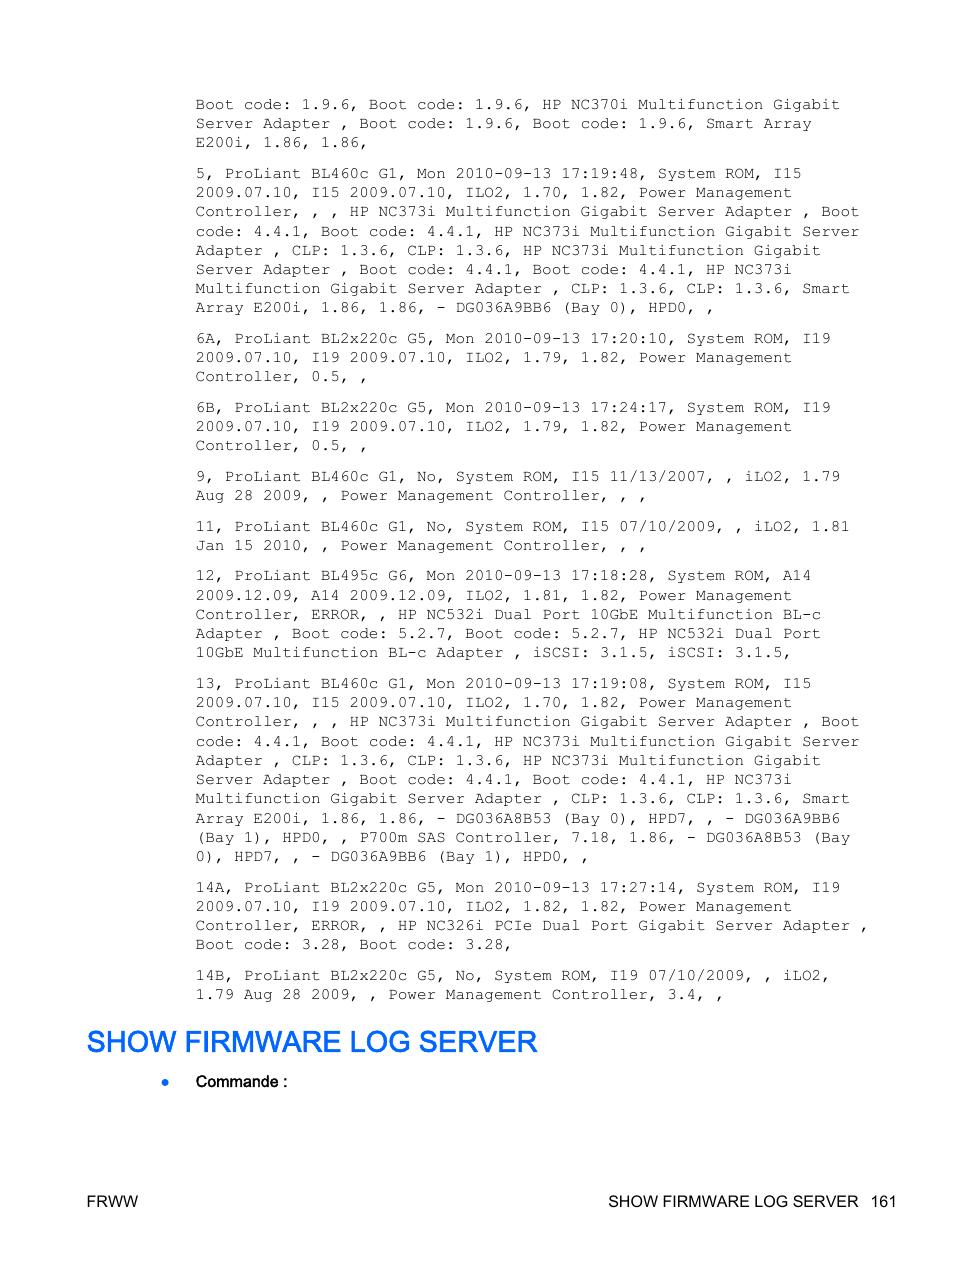 Show firmware log server | HP Onboard Administrator Manuel d